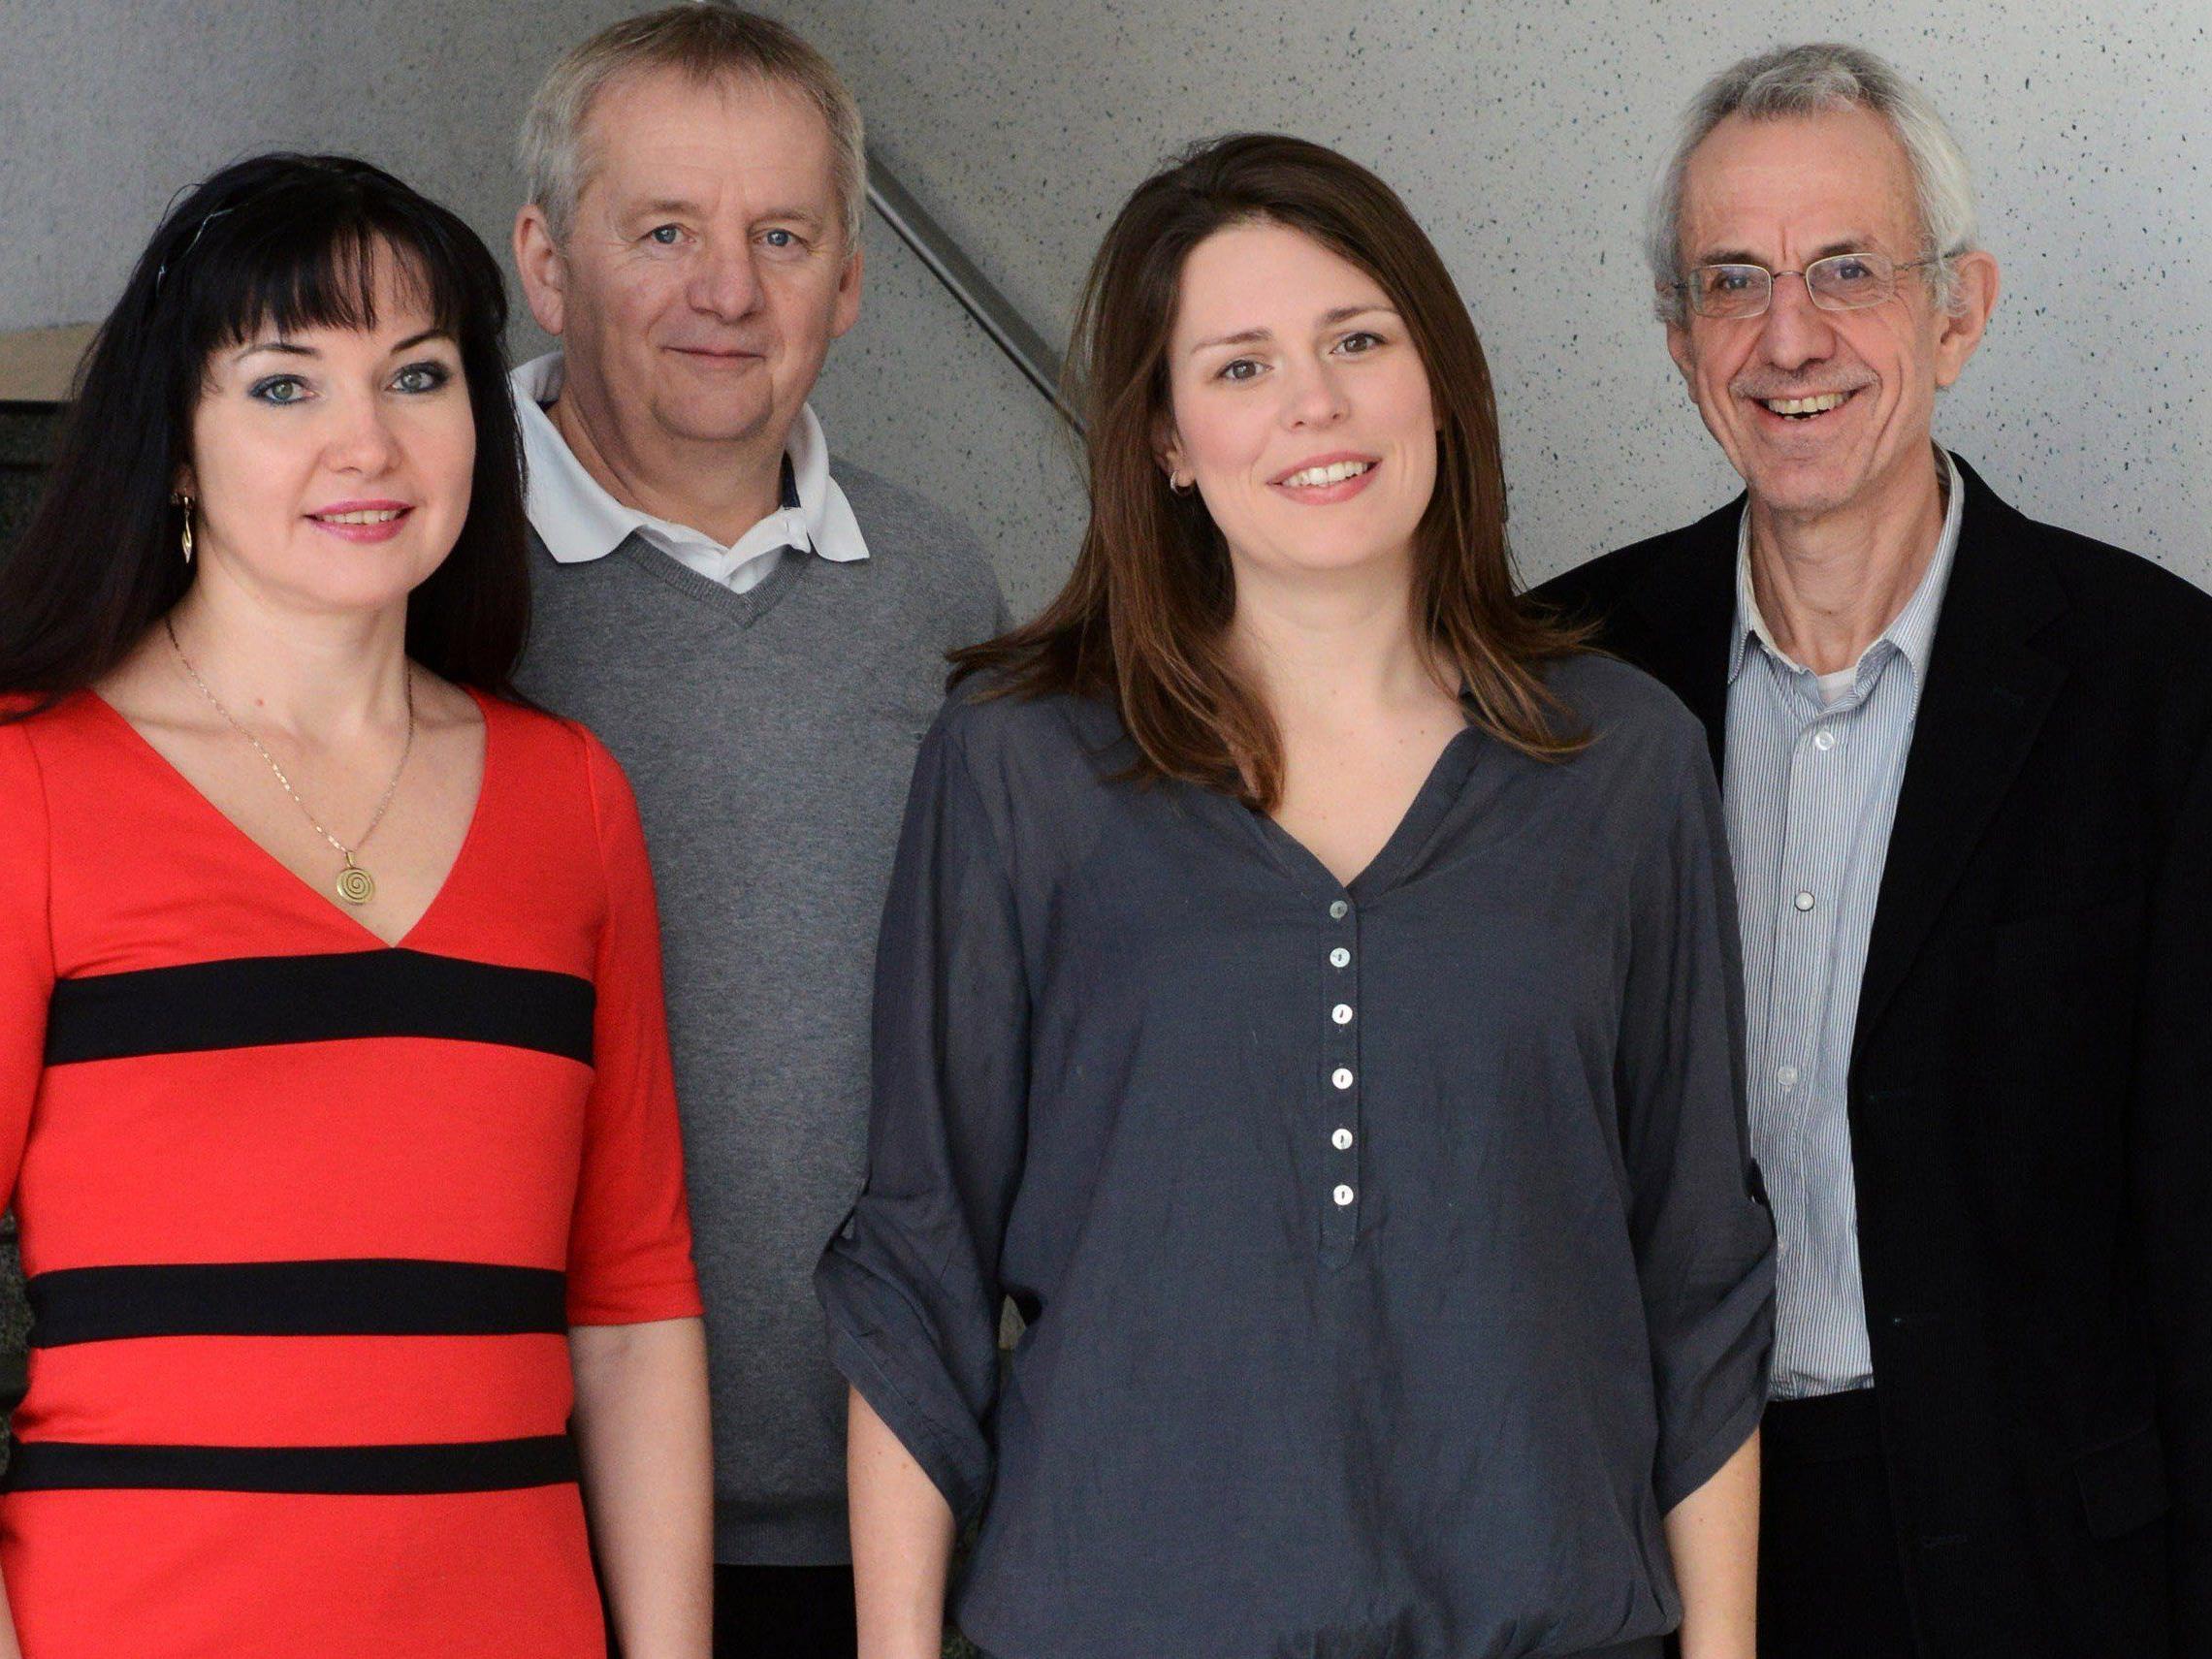 Team Soziale Demokraten und Unabhängige: v.li. Elena Karnowsky, GV Helmut Madlener, Mag. Vera Köpruner, GV Werner Nesensohn.